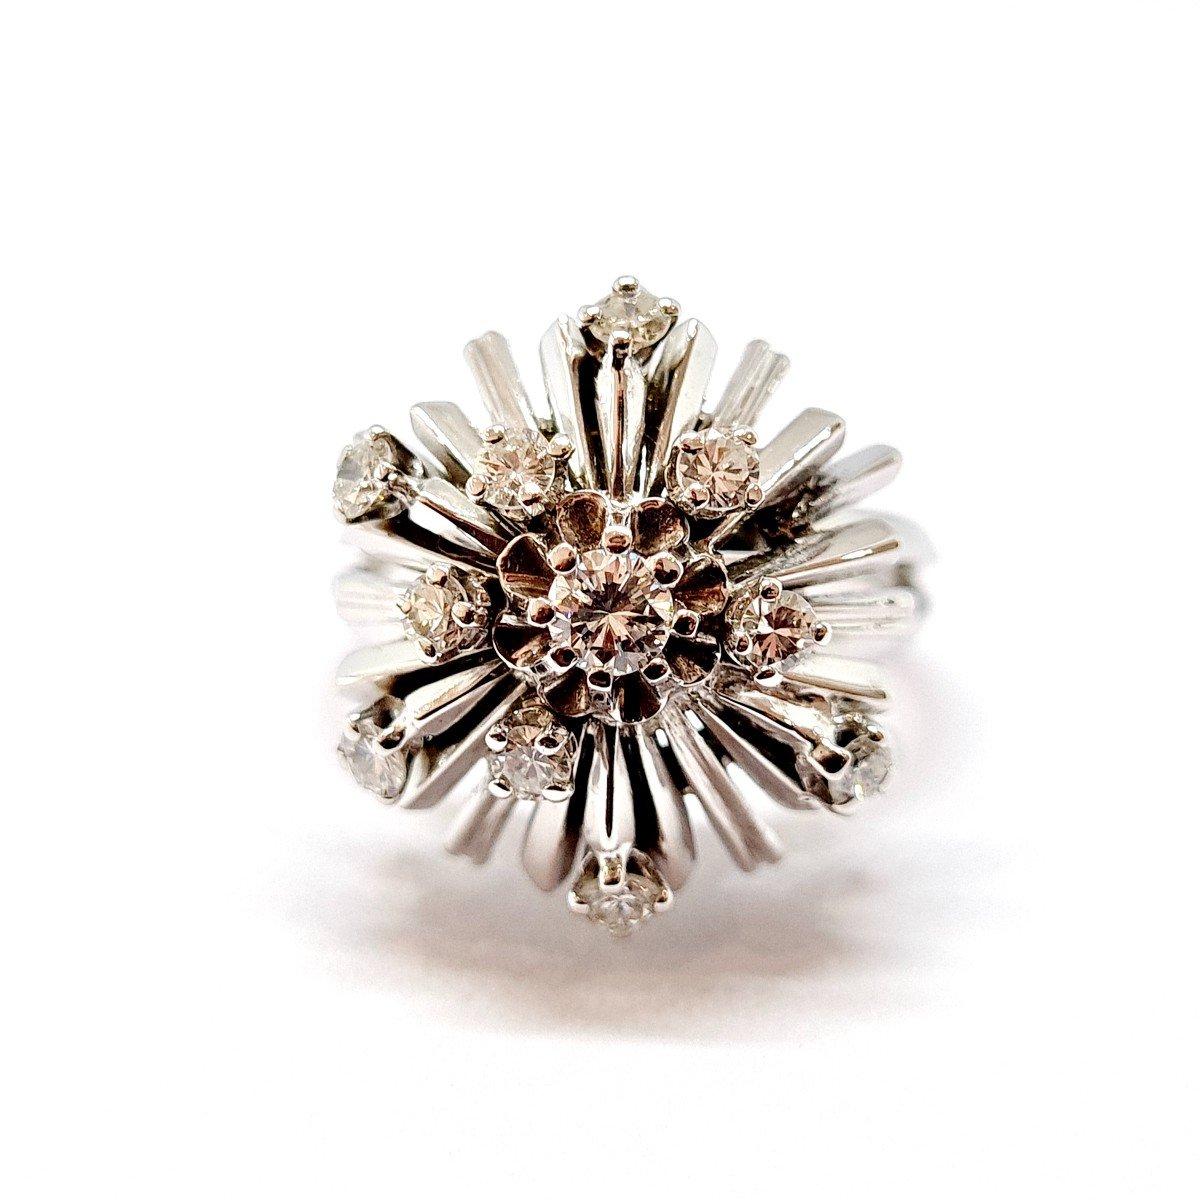 Bague Ancienne Or Blanc 18 Carats Diamants